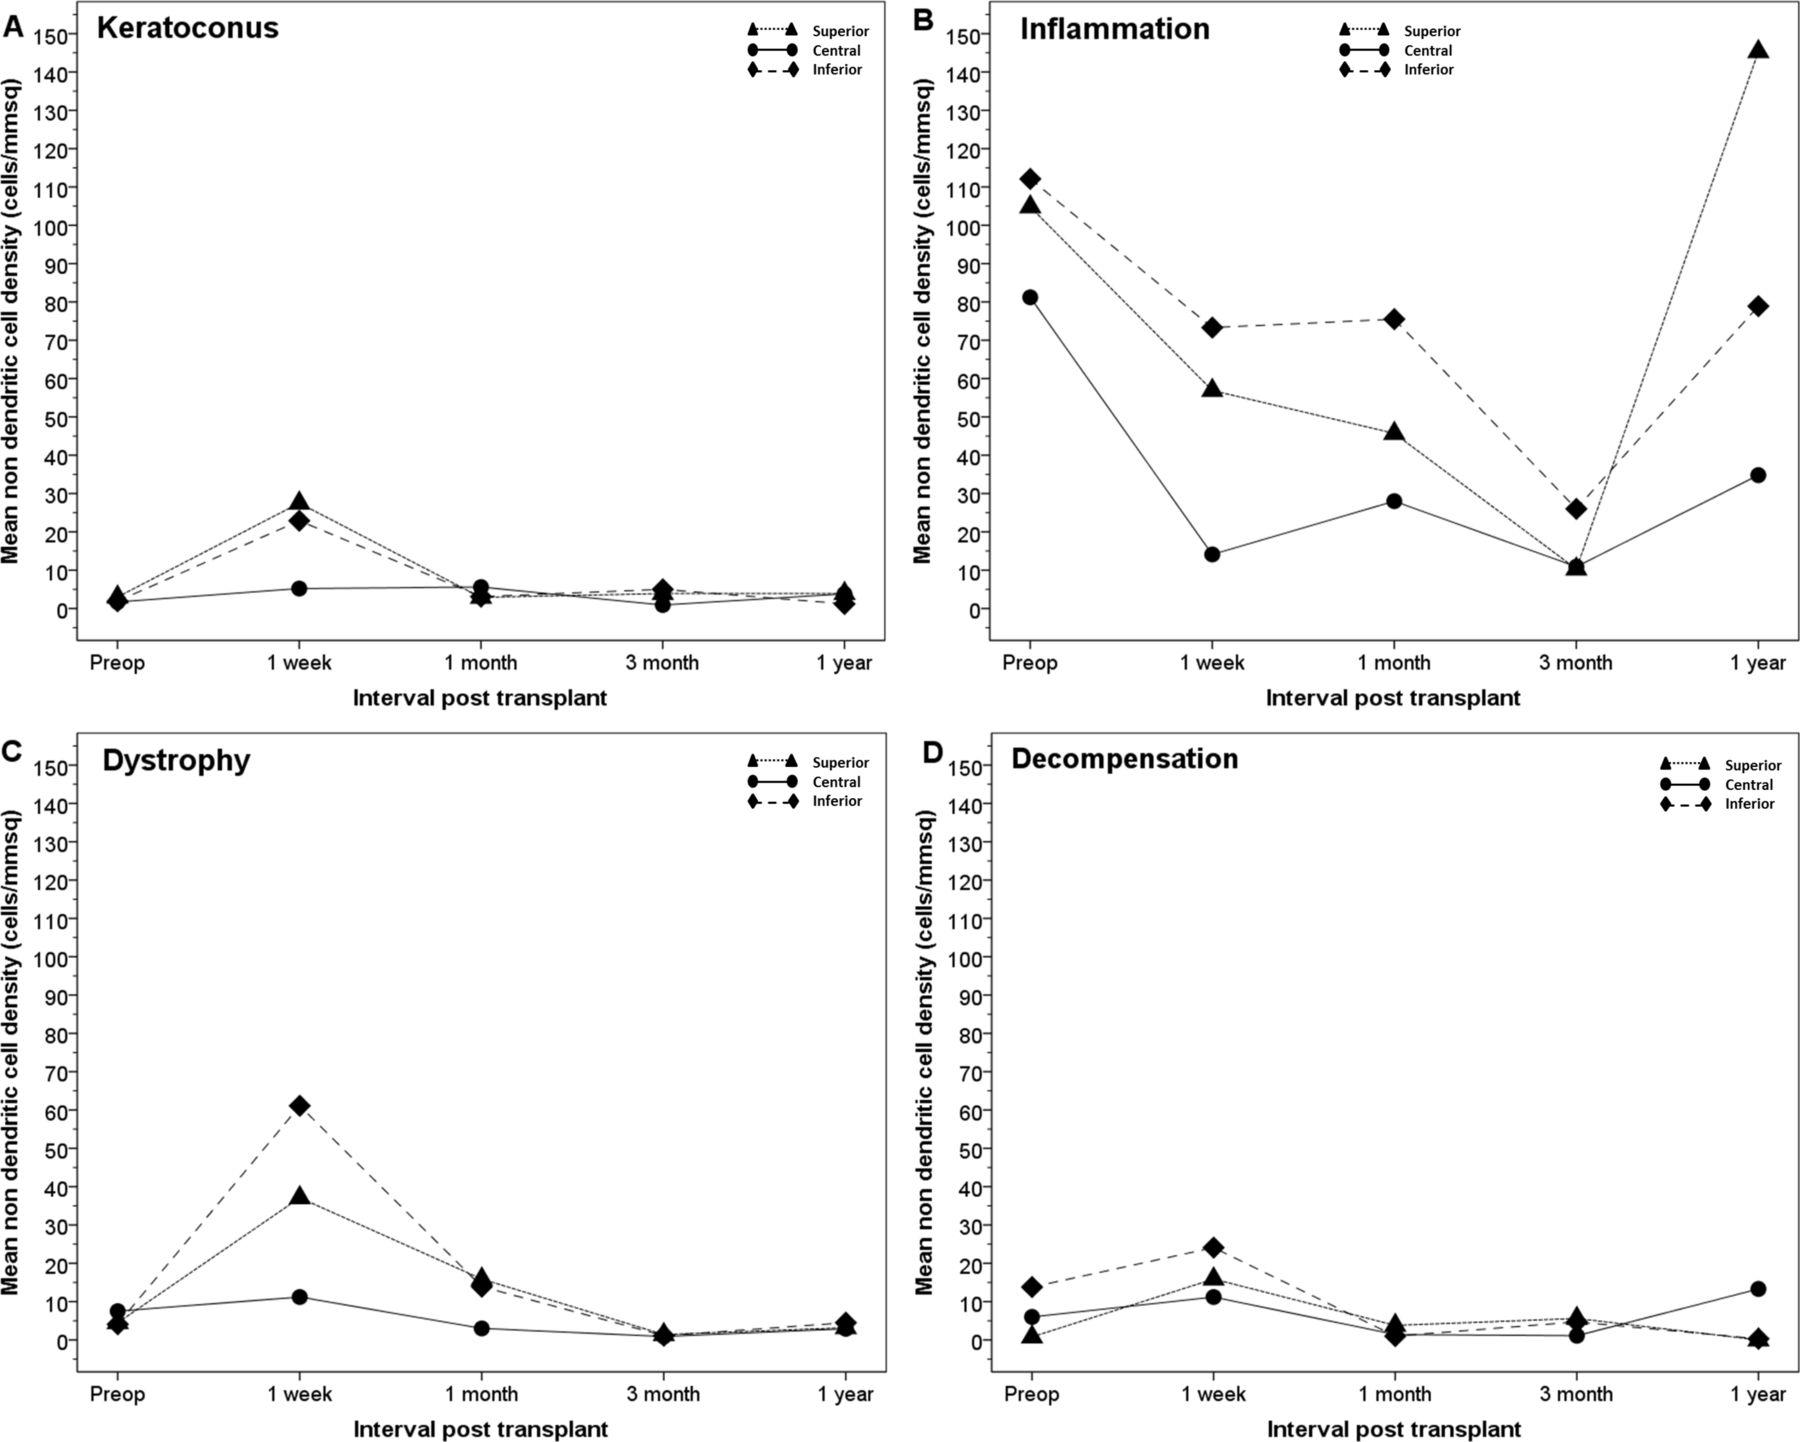 Longitudinal changes in corneal leucocyte density in vivo following